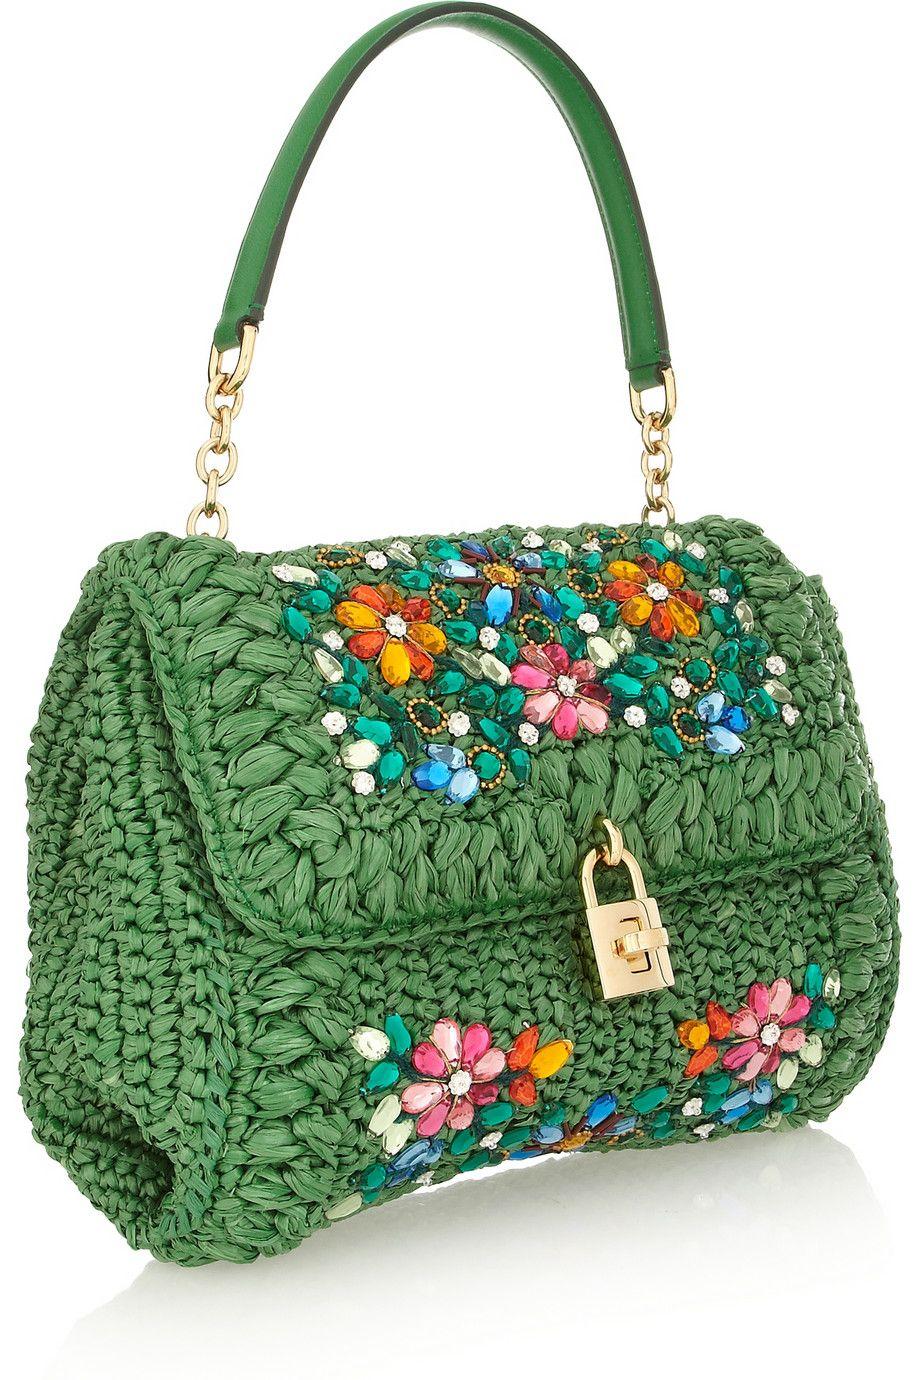 Dolce   gabbana Miss Dolce Medium Embellished Raffia and Leather Shoulder  Bag in Green   Lyst b715e2d867